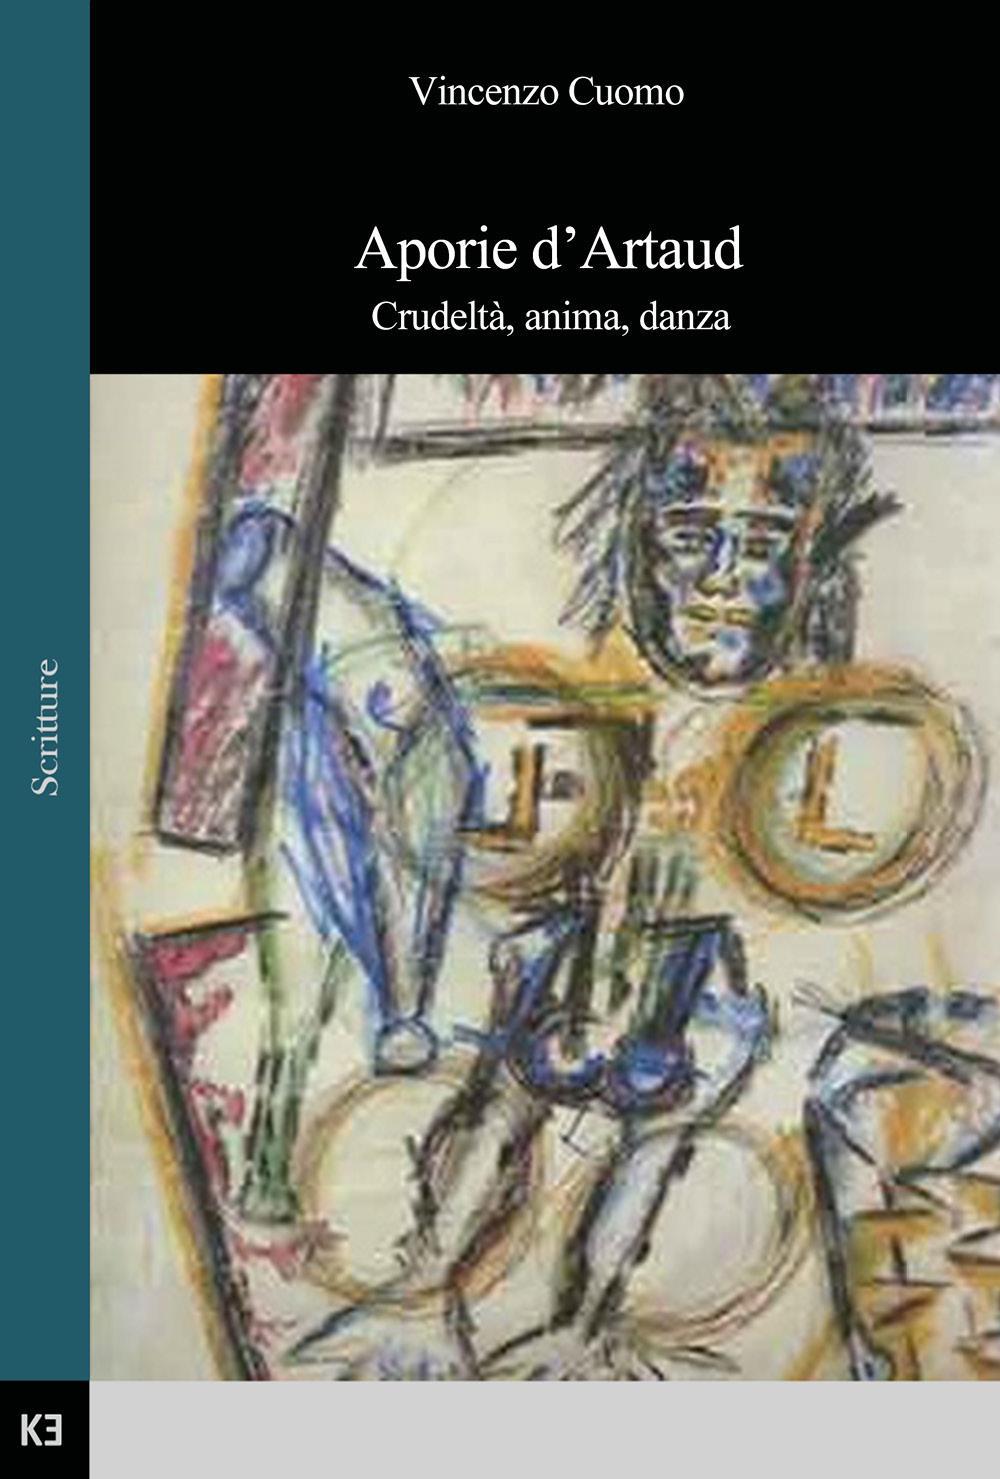 Aporie d'Artaud. Crudeltà, anima, danza